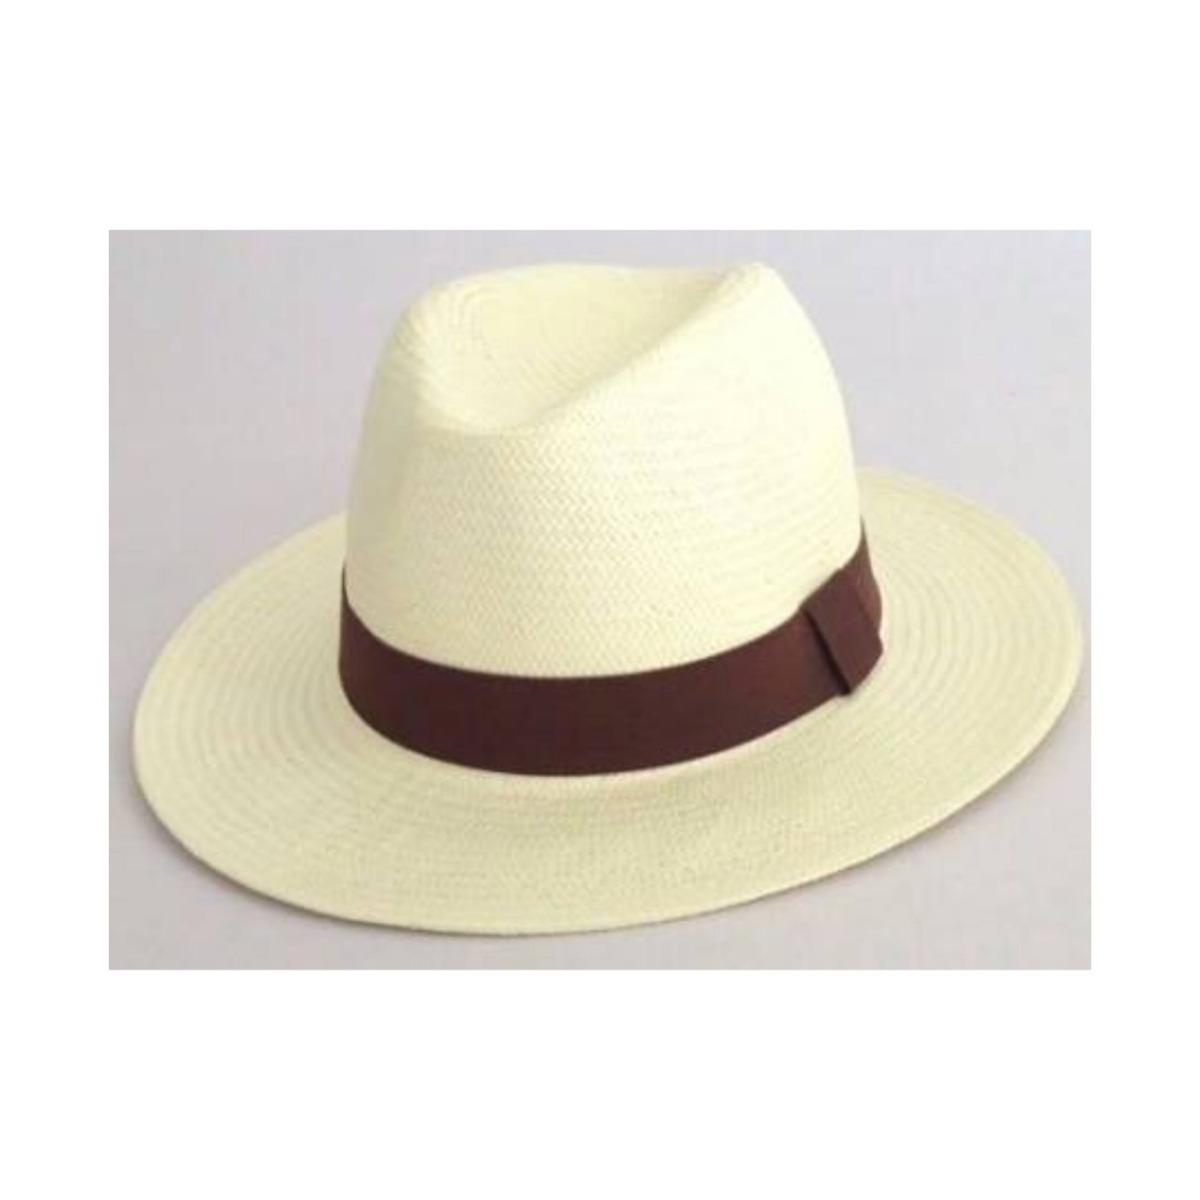 9509825093059 Carregando zoom... 4 chapéu aba longa moda panamá clássico casual praia  unissex